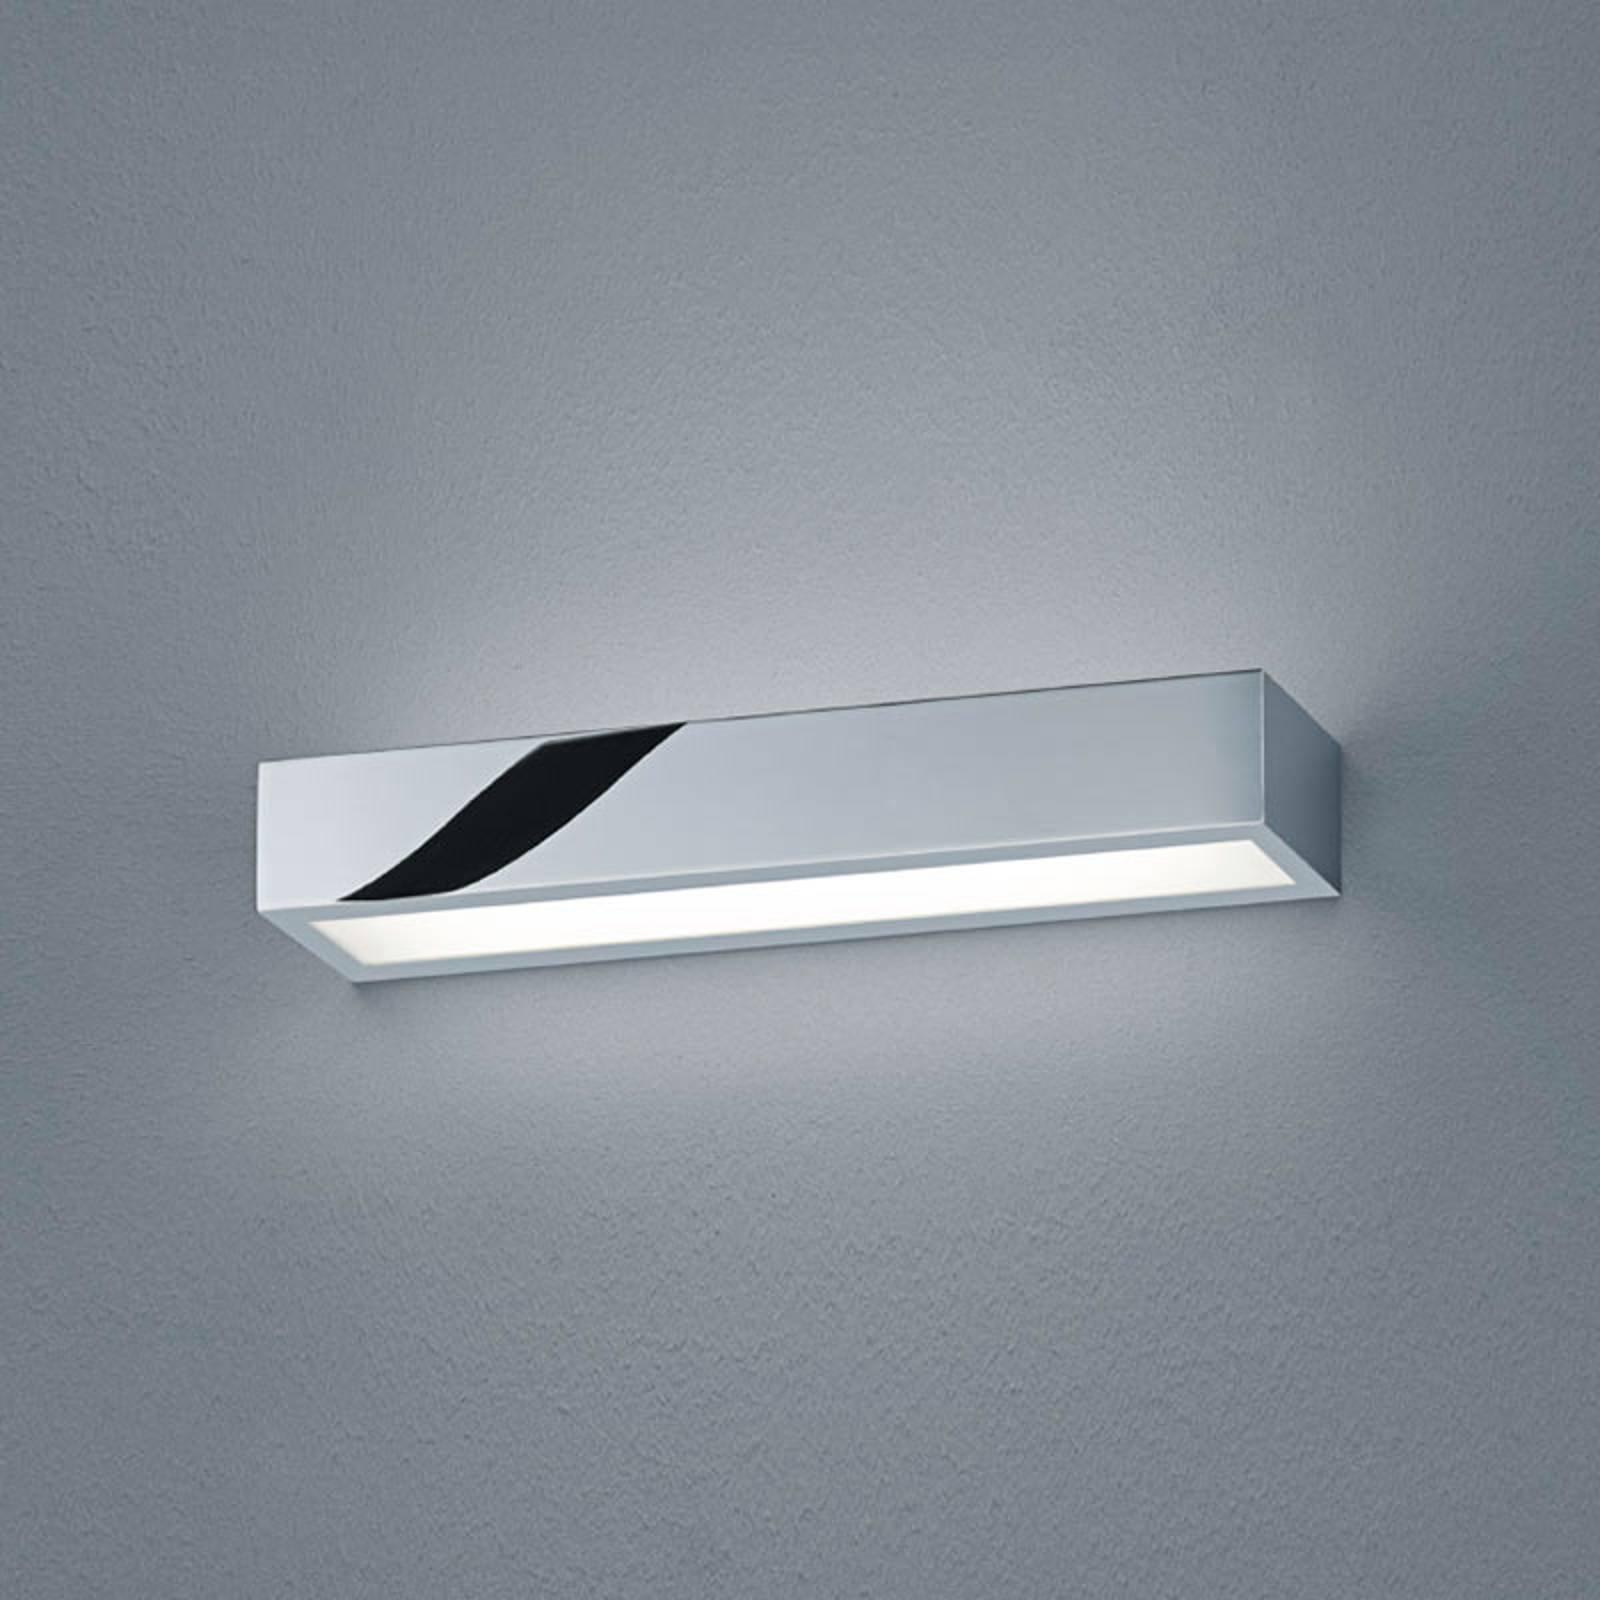 Helestra Theia LED-speillampe, forkrommet, 30 cm